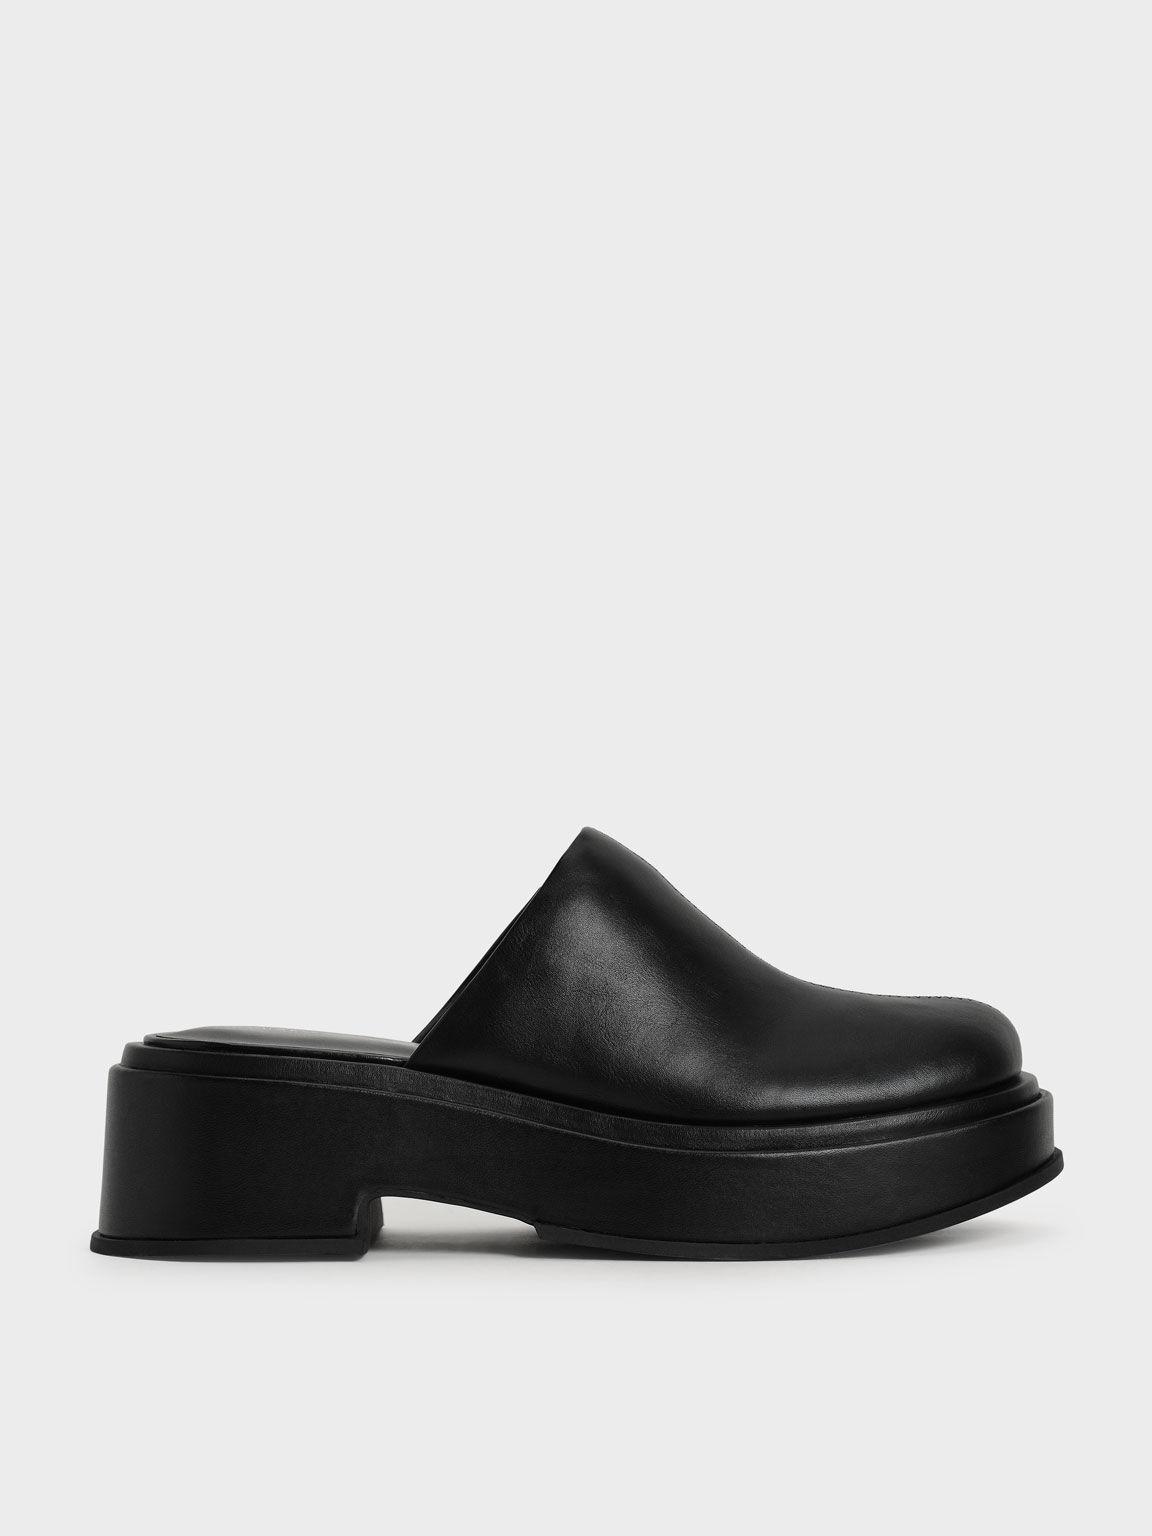 Platform Clogs, Black, hi-res